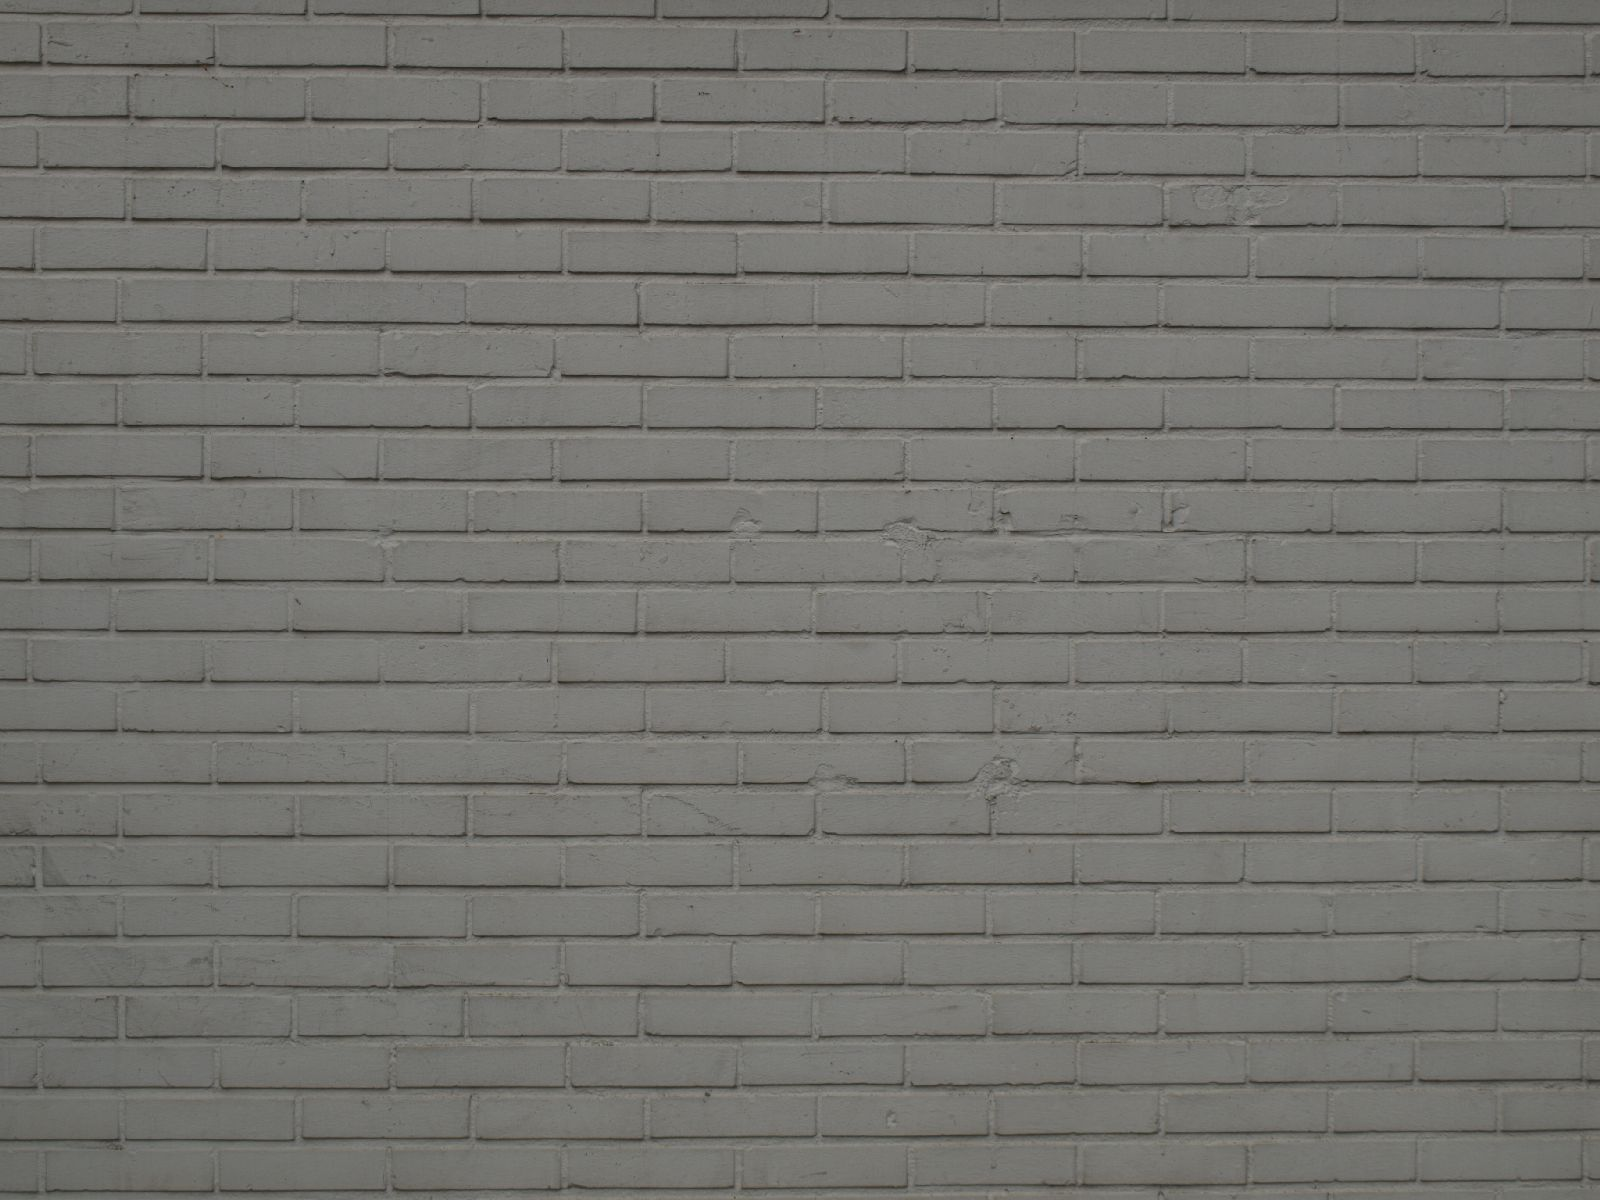 Wand-Mauerwerk-Backstein_Textur_A_P8204496